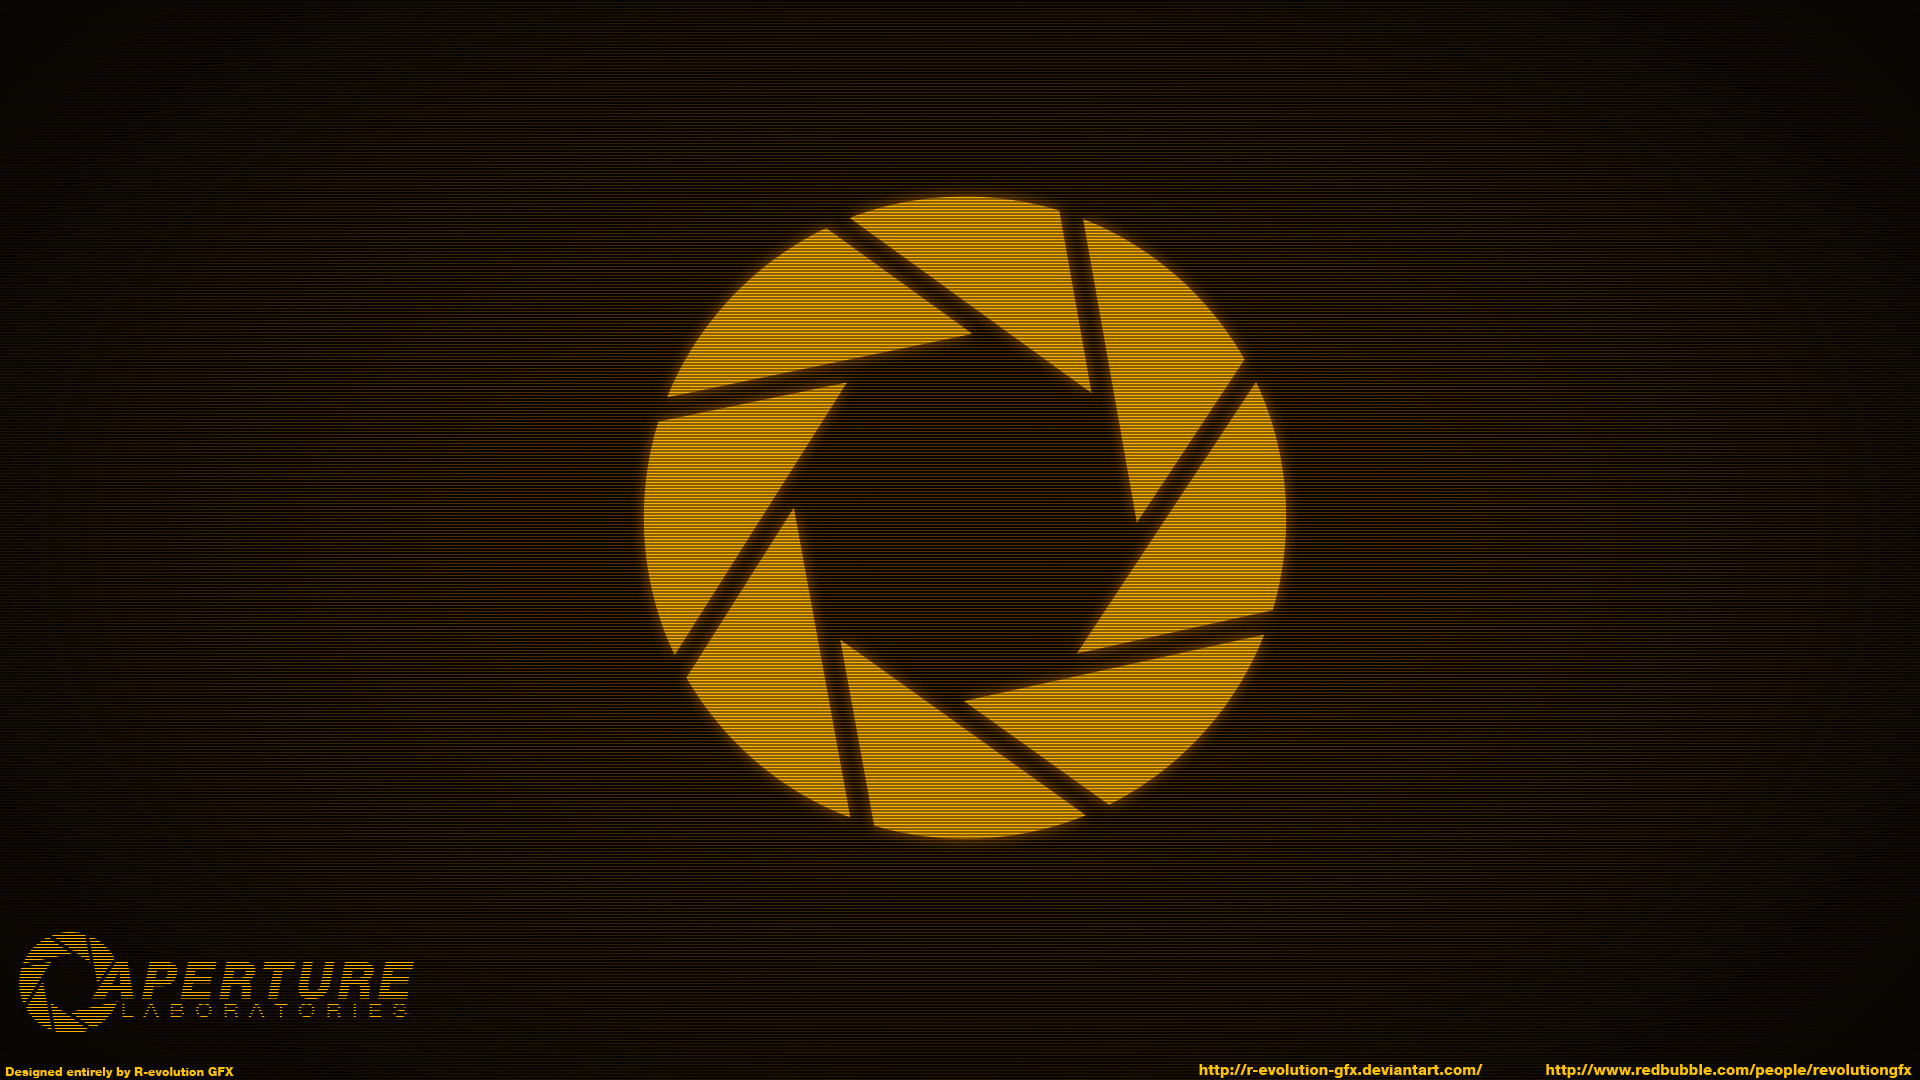 Aperture Laboratories Logo wallpaper - 272964